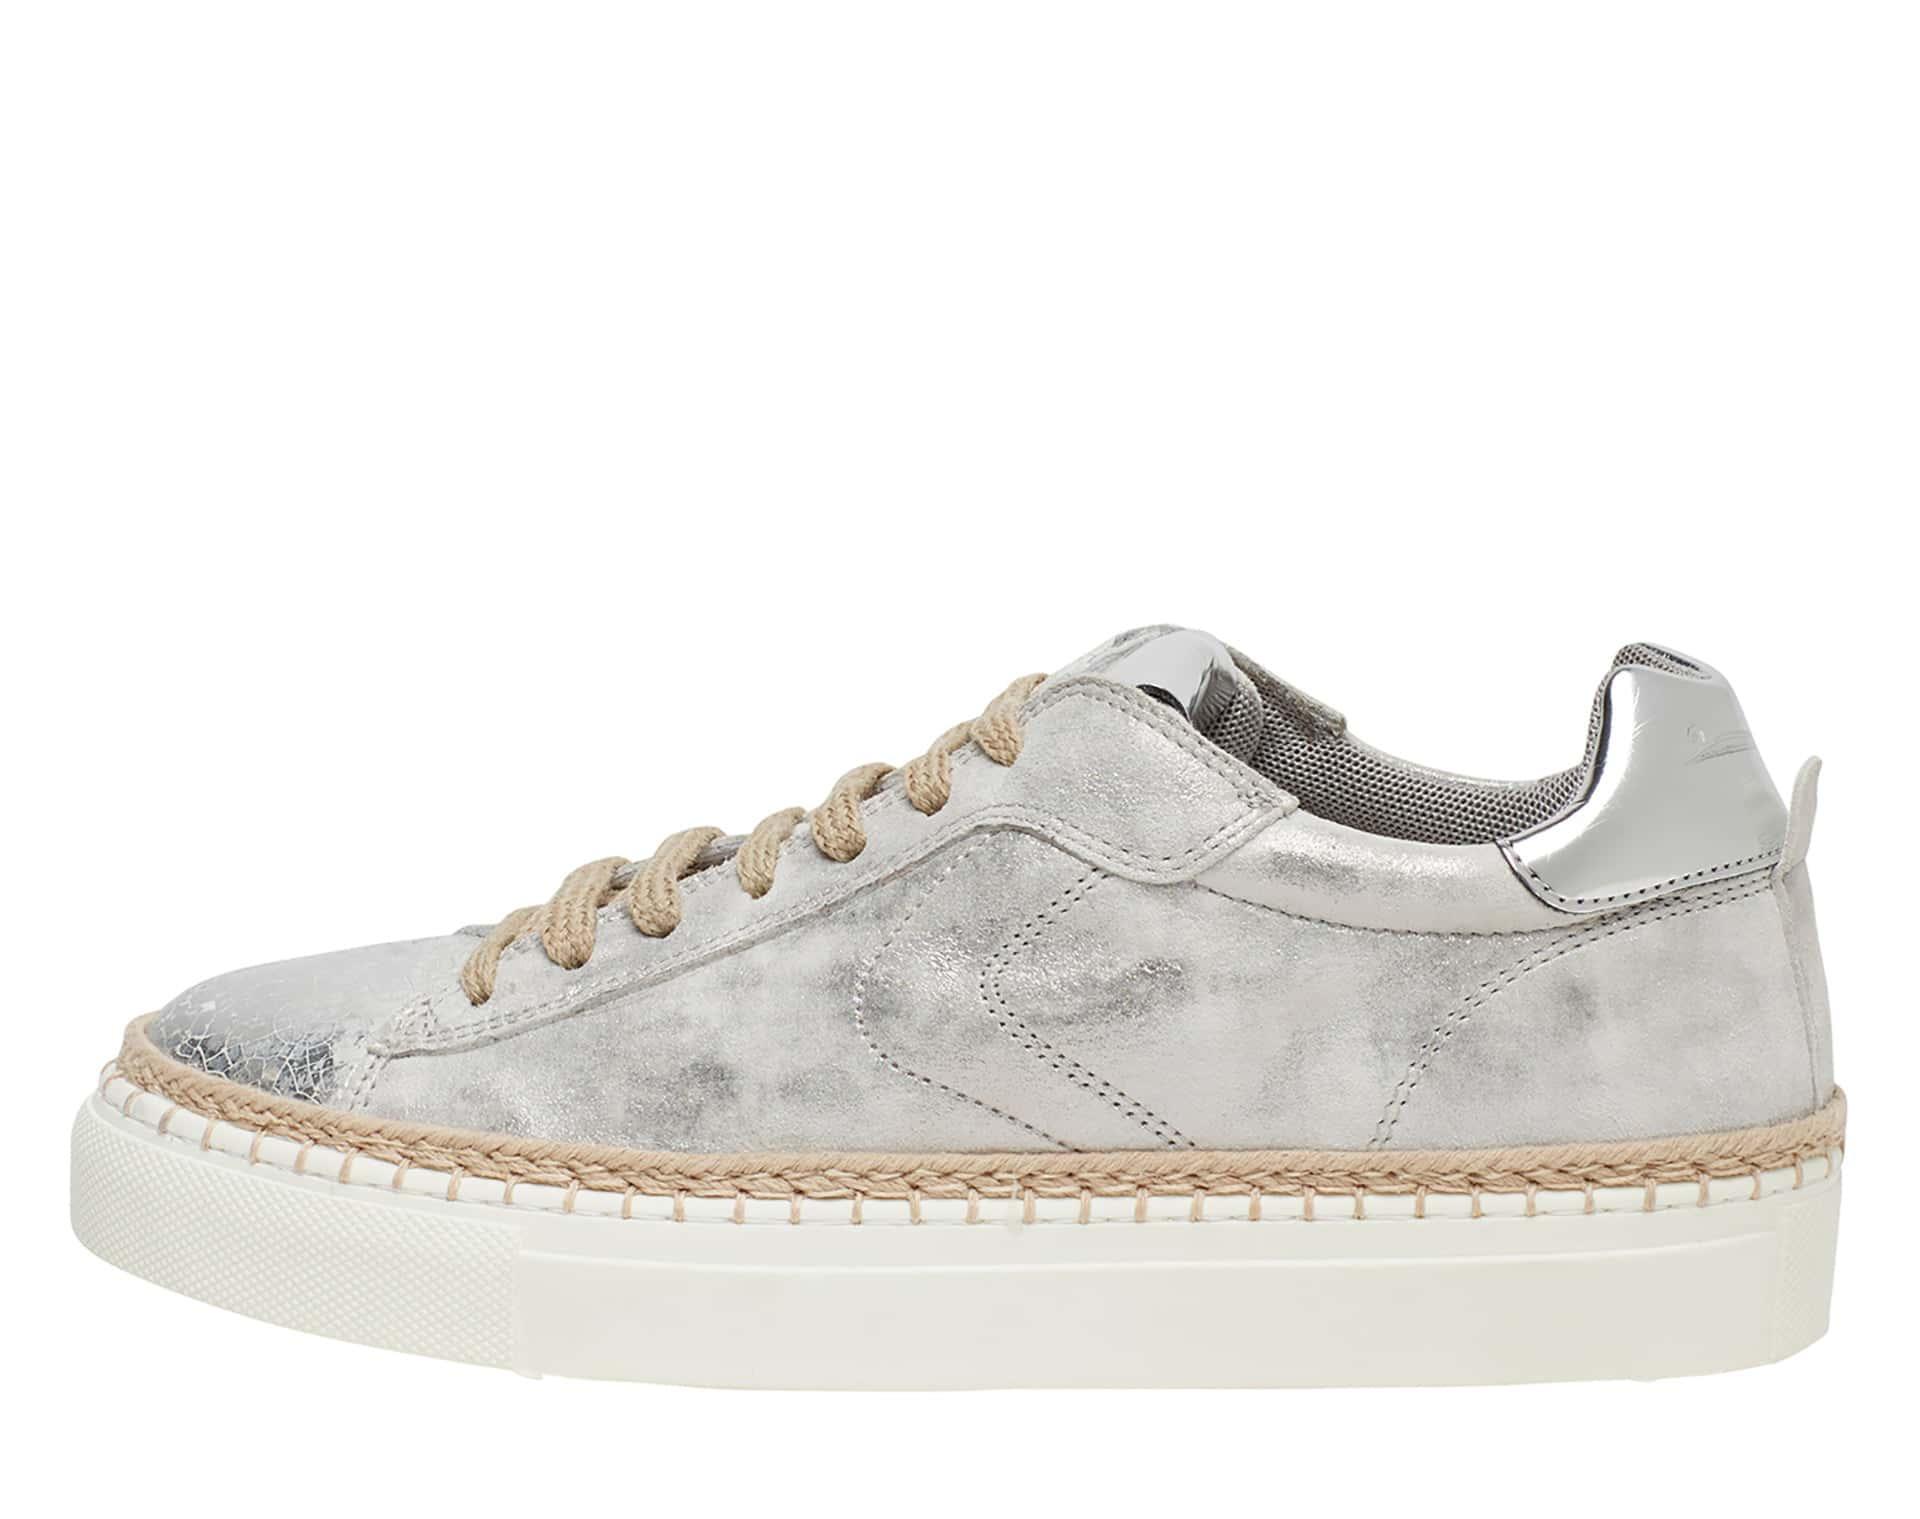 PANAREA - Leather sneakers - Silver